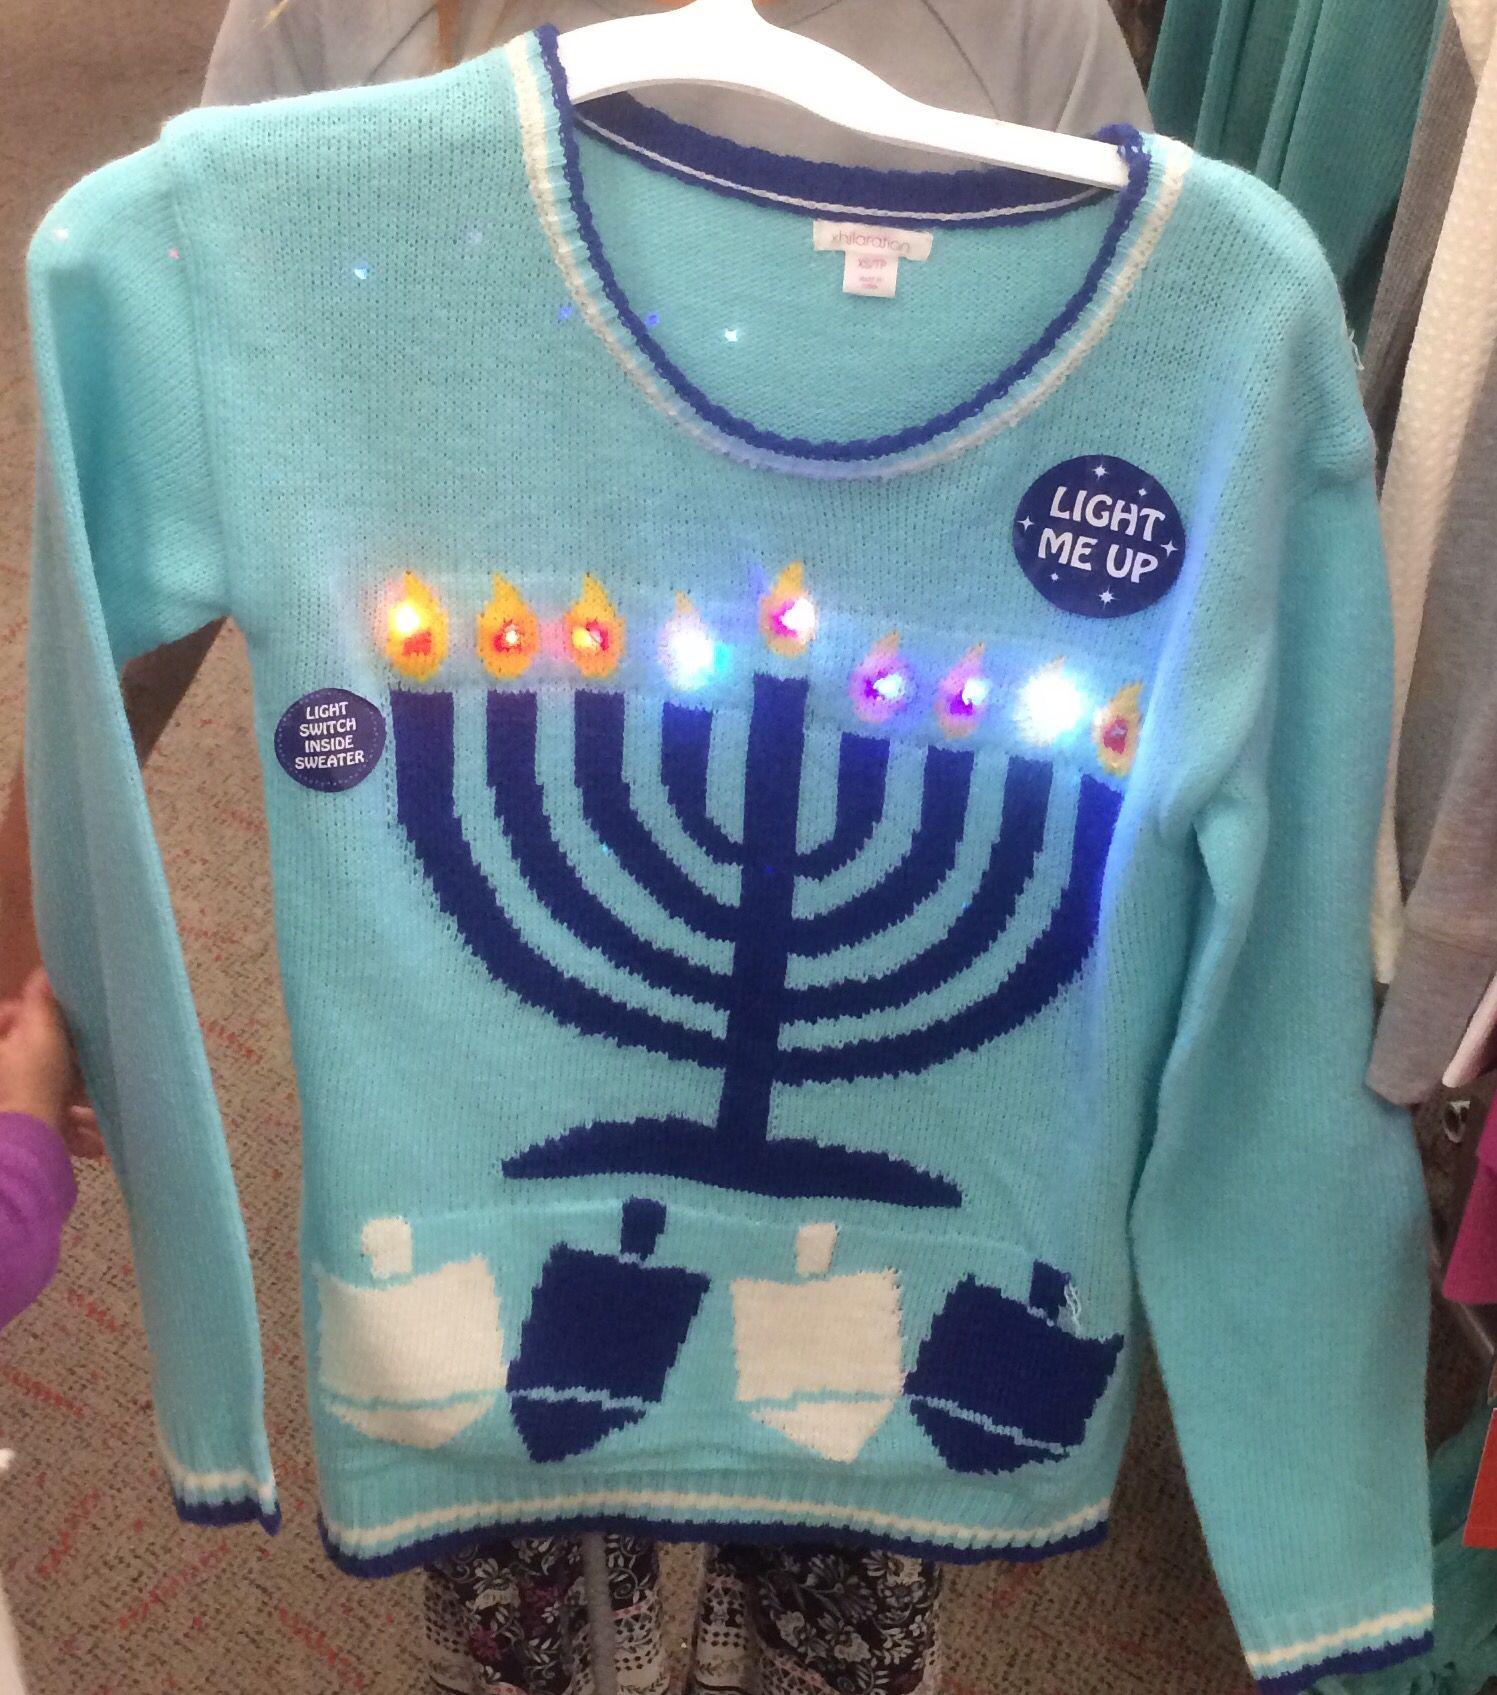 Hanukkah Sweater From Target Holidays Hanukkah Hanukkah